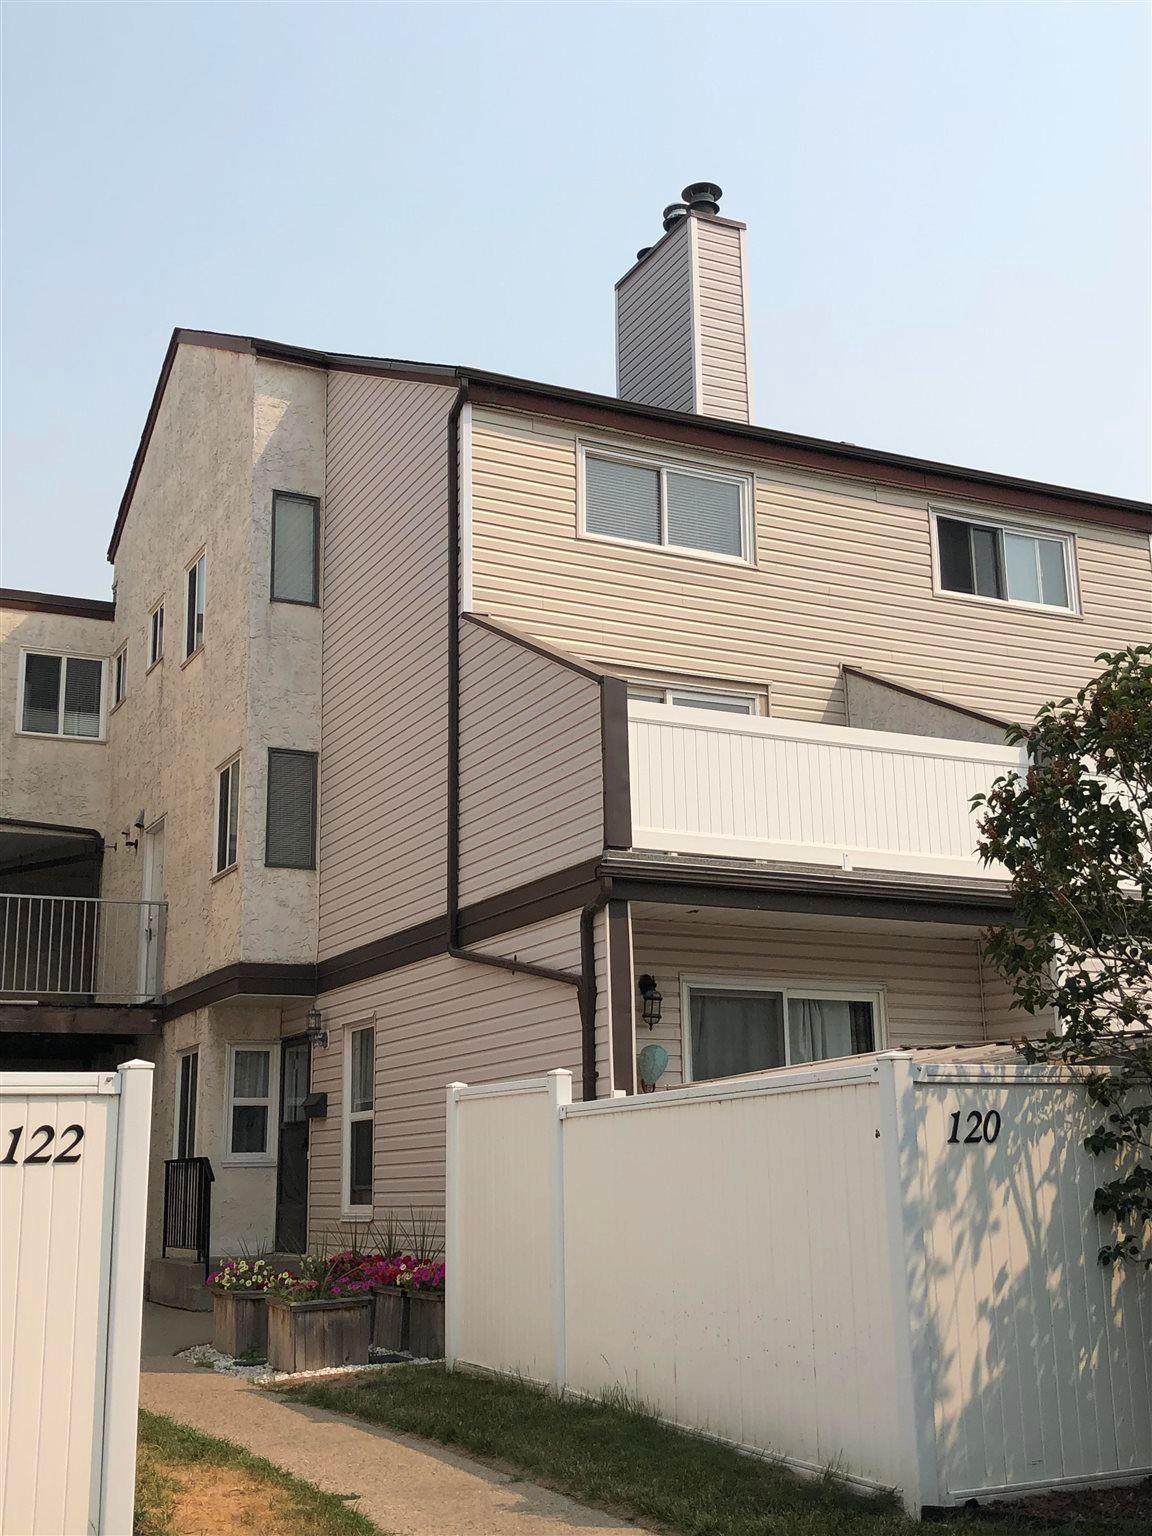 Main Photo: 125 LANCASTER Terrace in Edmonton: Zone 27 Townhouse for sale : MLS®# E4254544